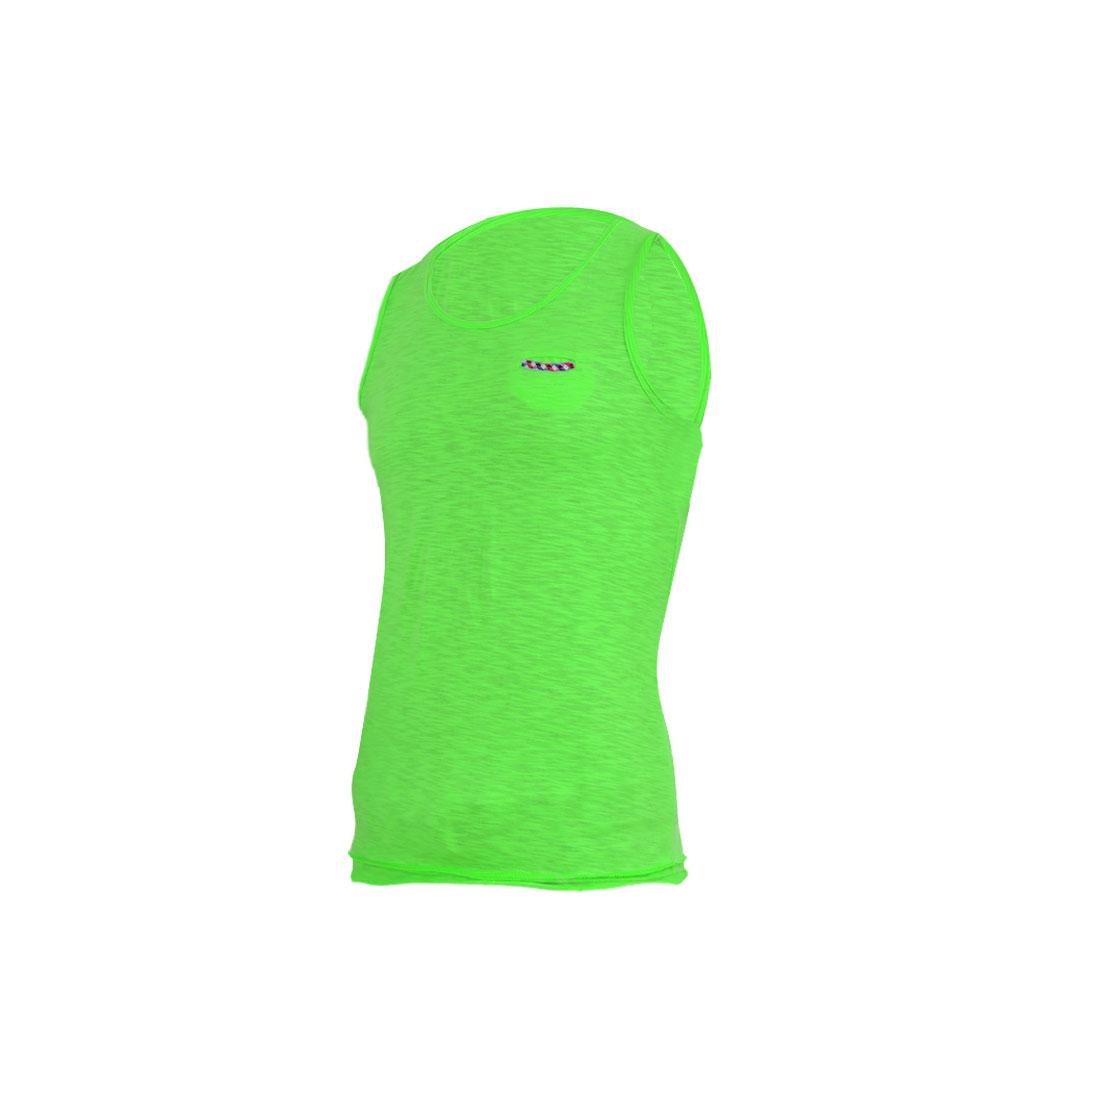 Men Stylish U Neck Pullover Chest Pocket Tank Top Light Green S